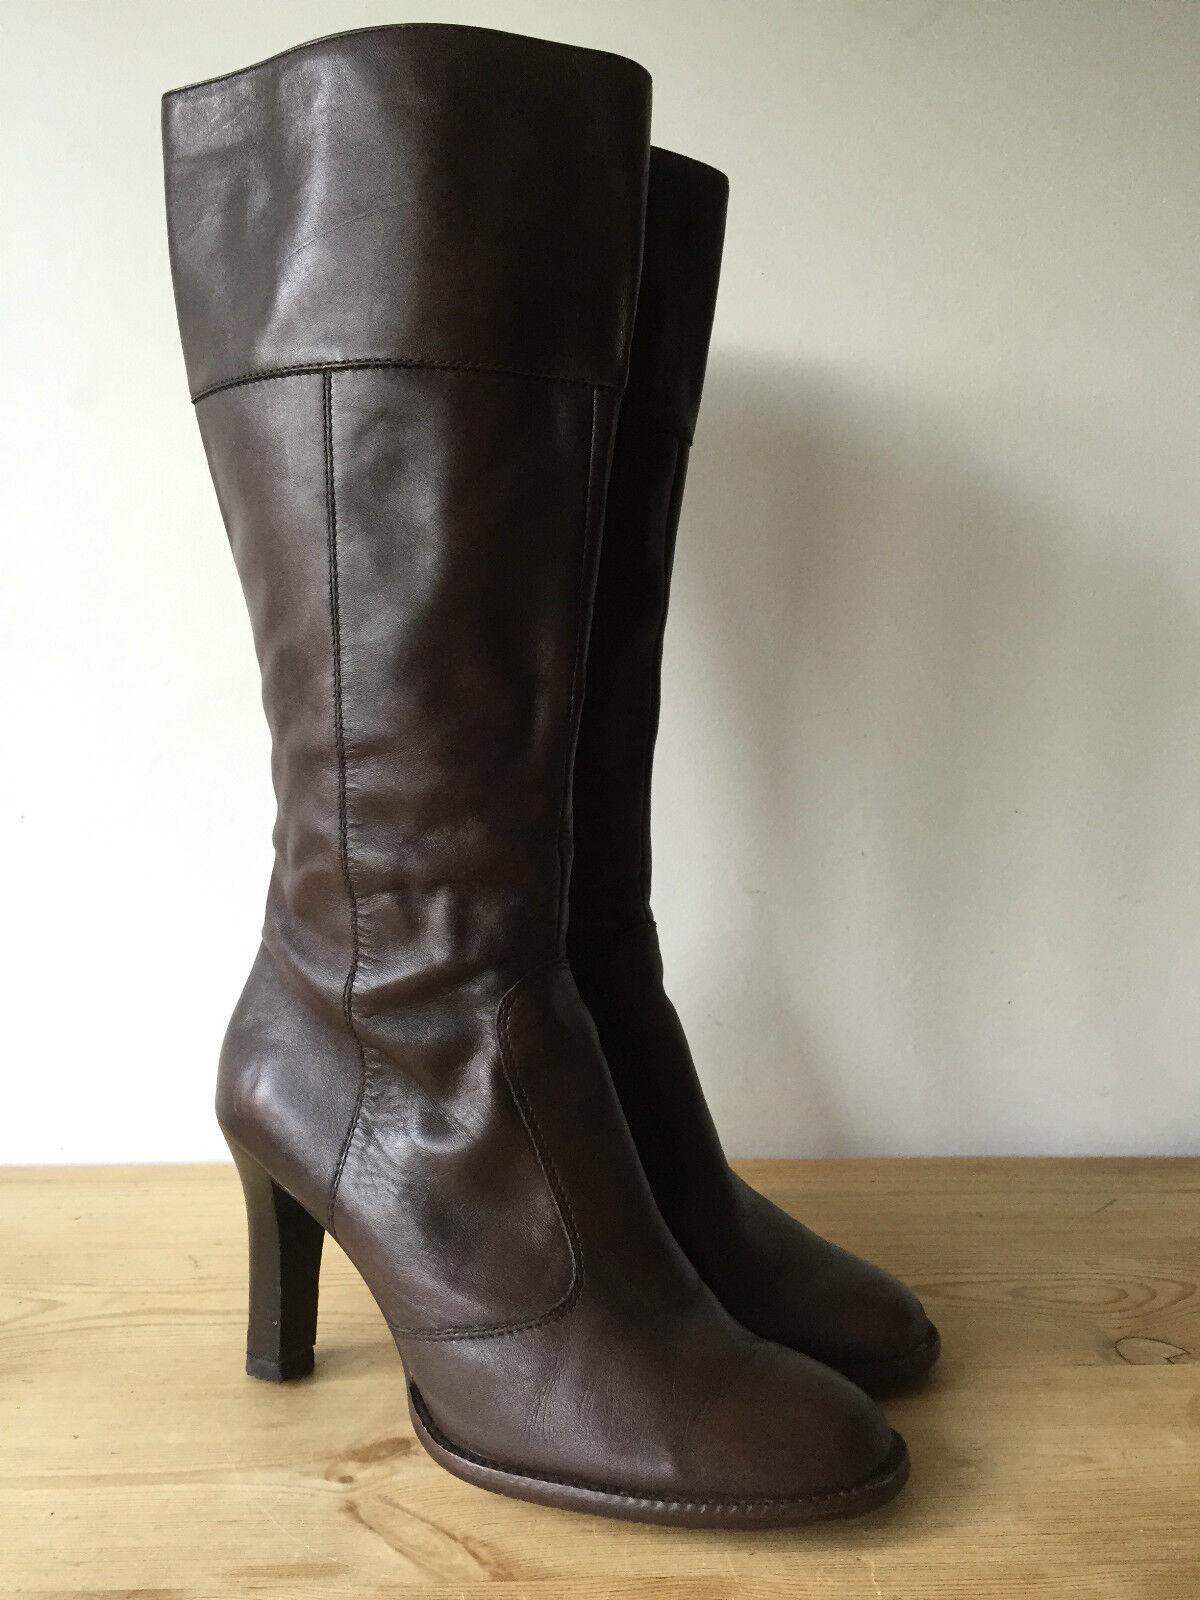 ALDO LADIES BROWN LEATHER KNEE HIGH BOOTS UK7